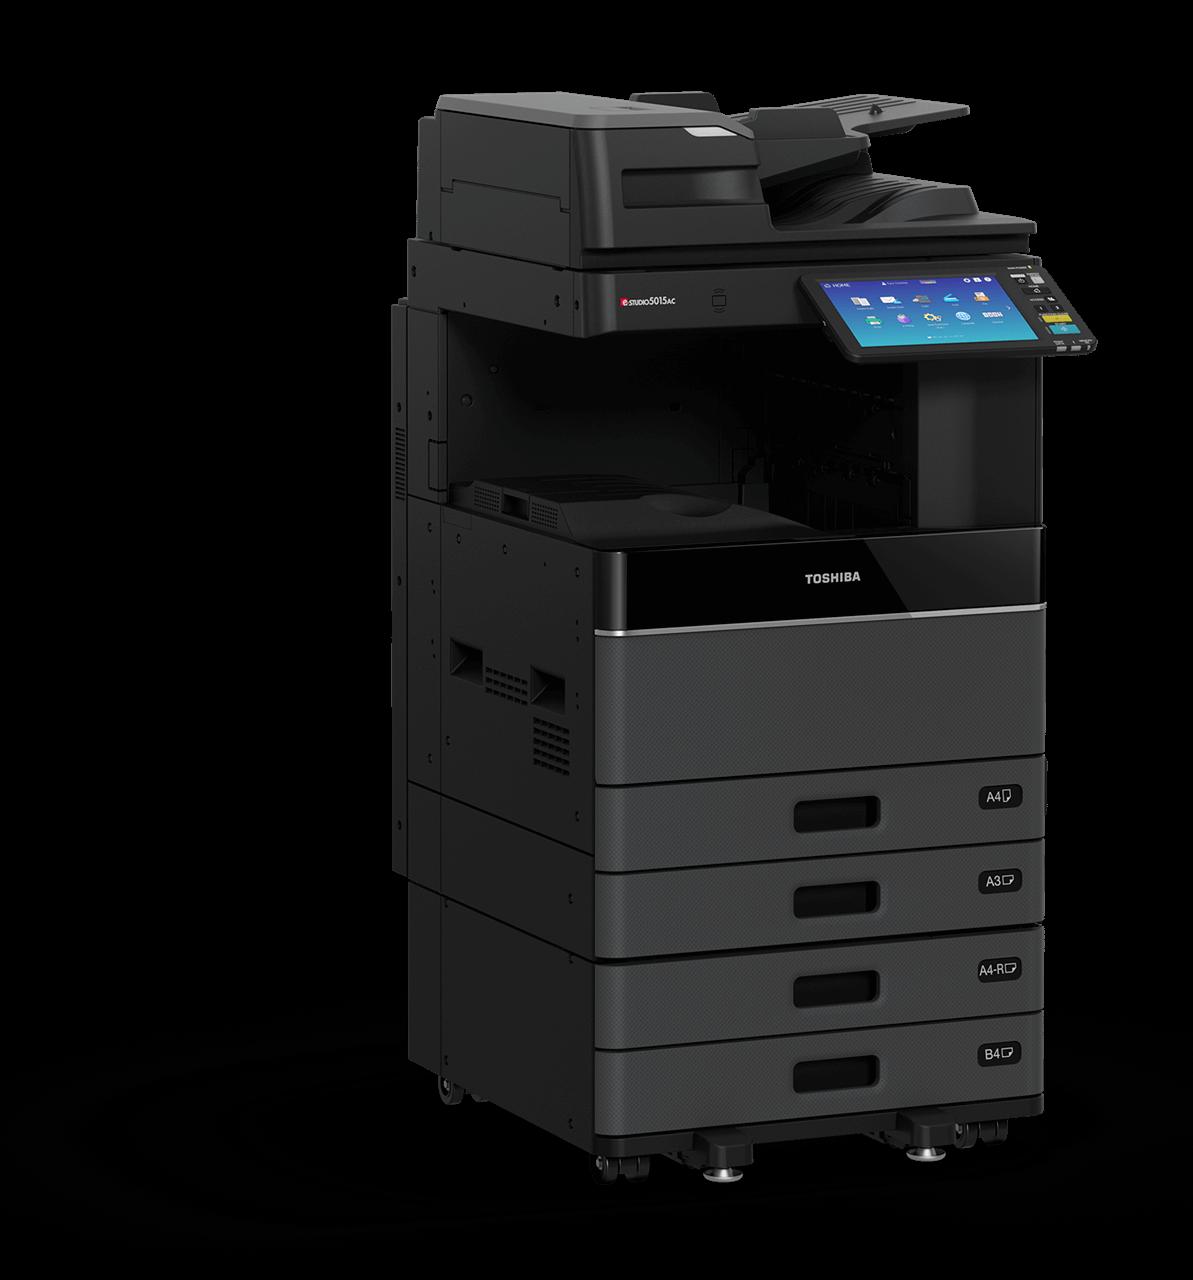 Cho thuê máy photocopy màu toshiba 2505AC